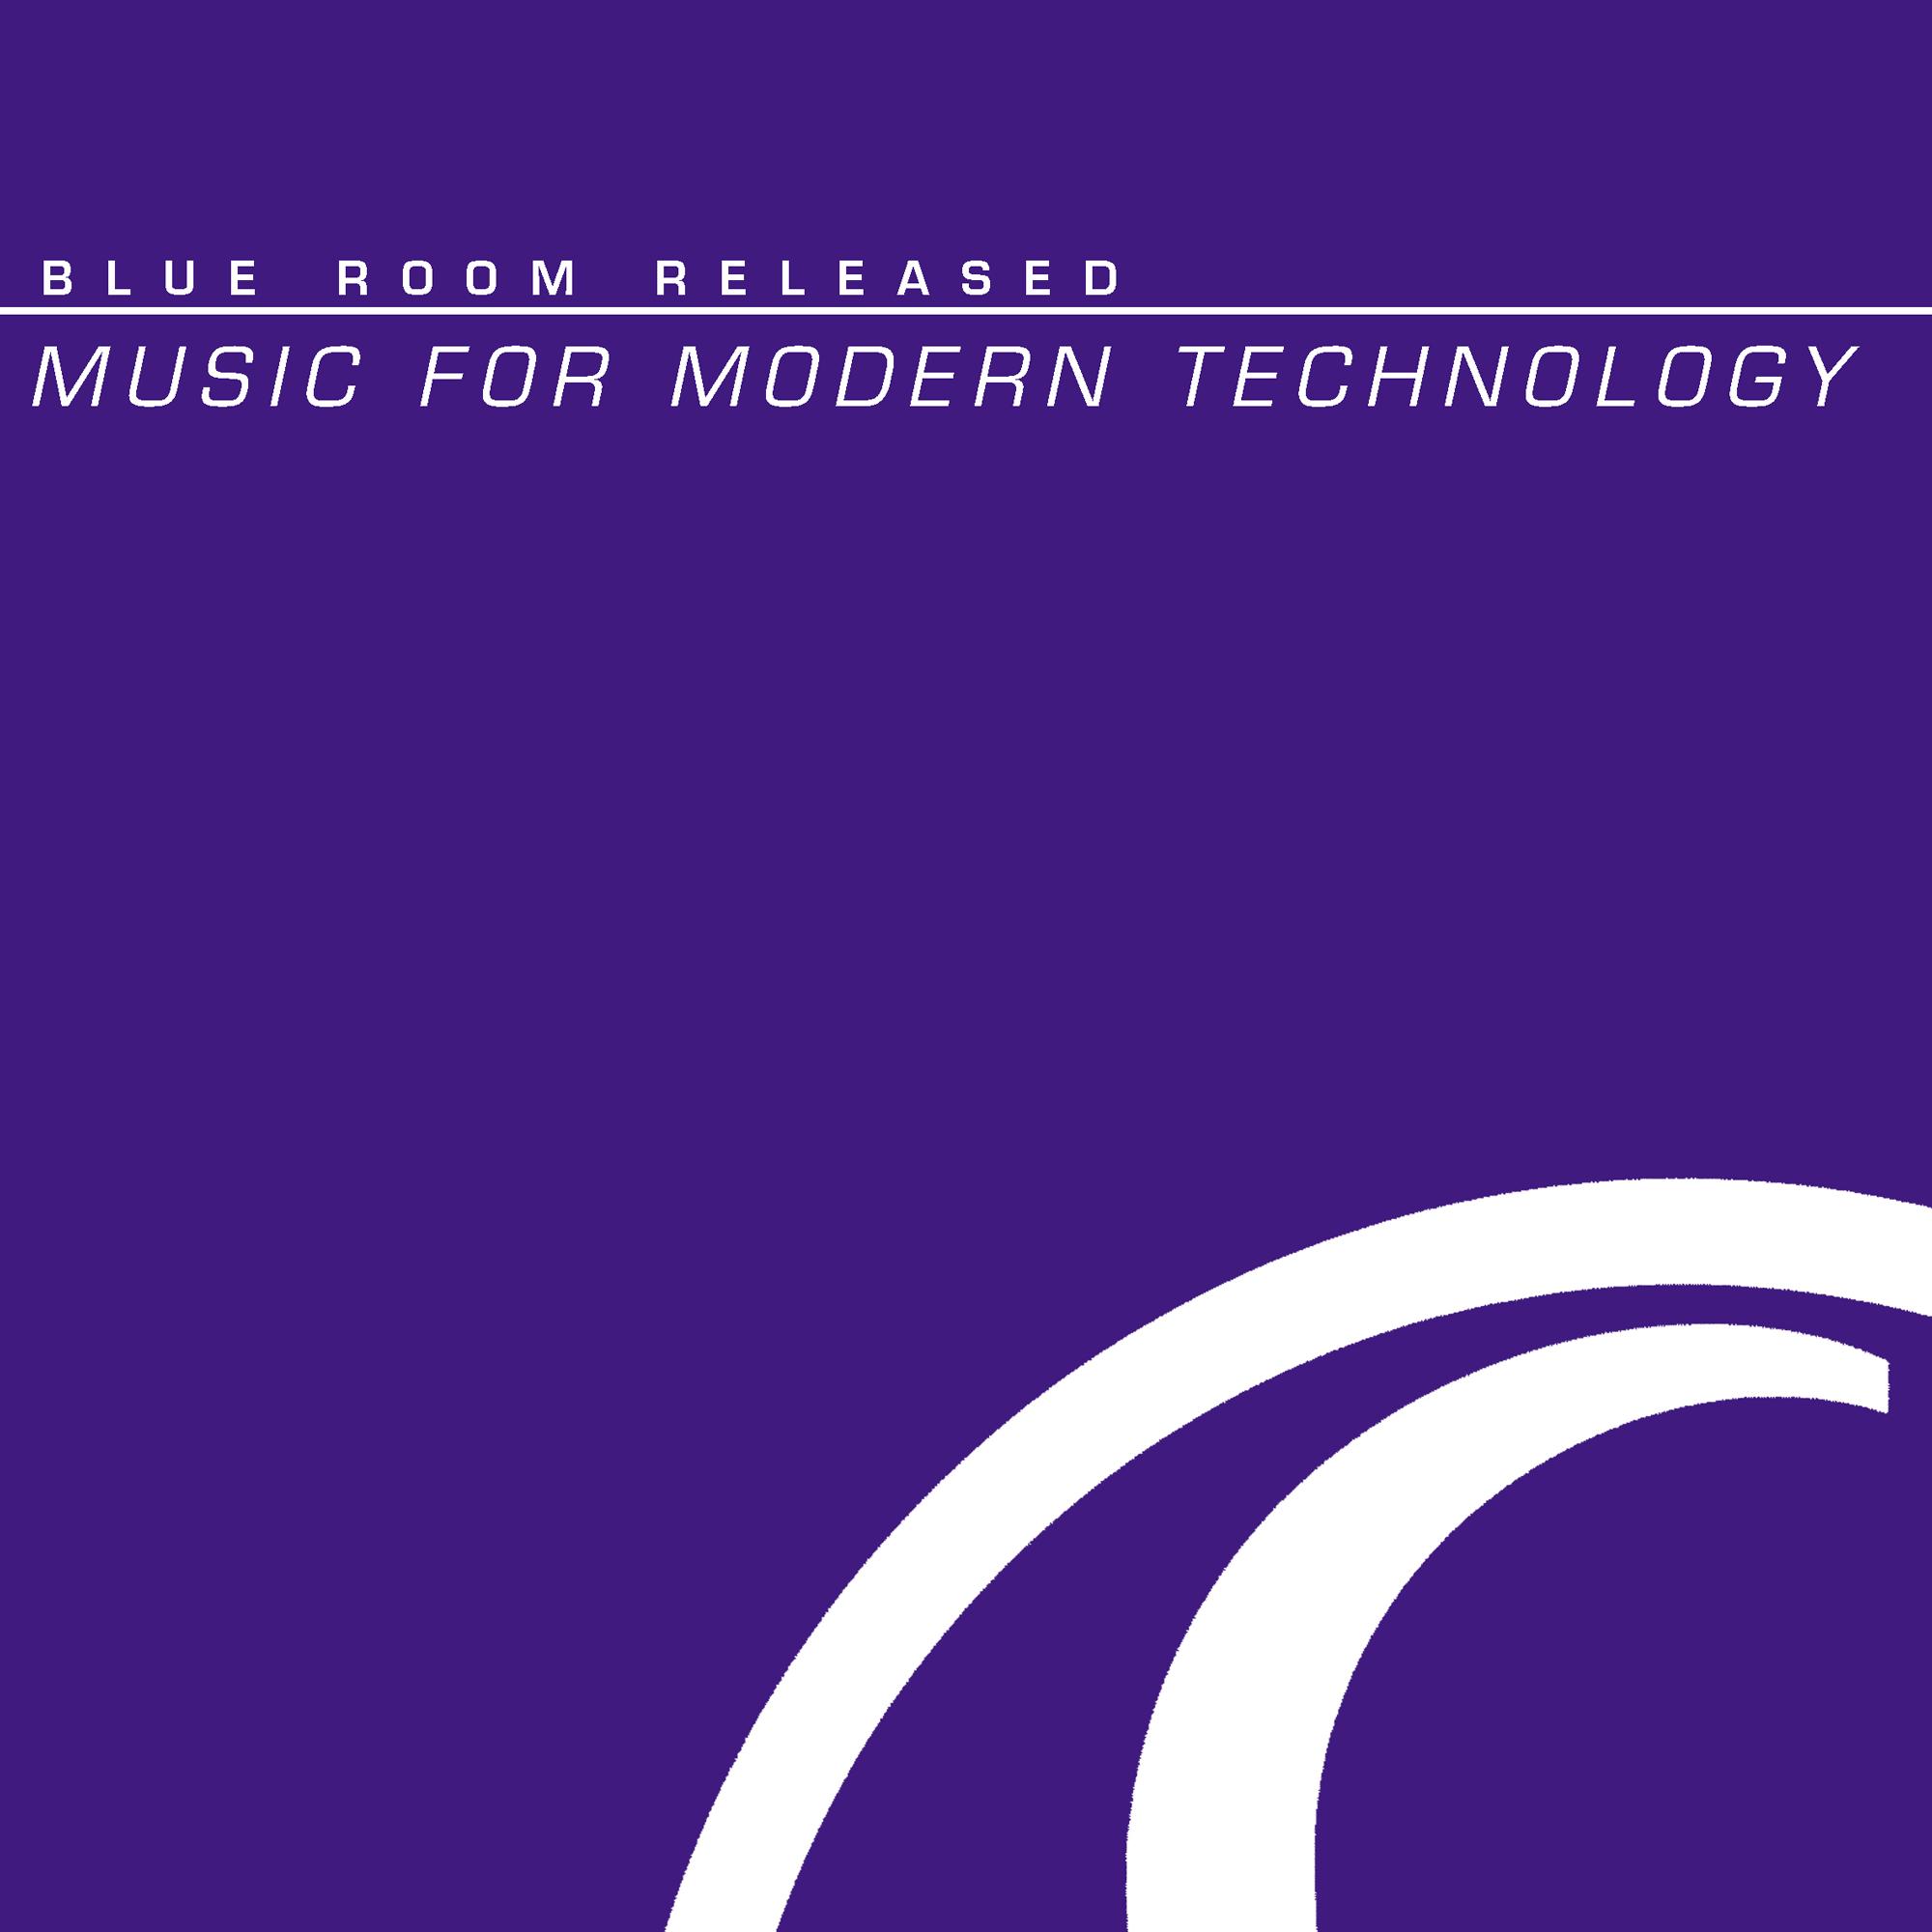 Music For Modern Technology - BLUE ROOM RELEASED 2001